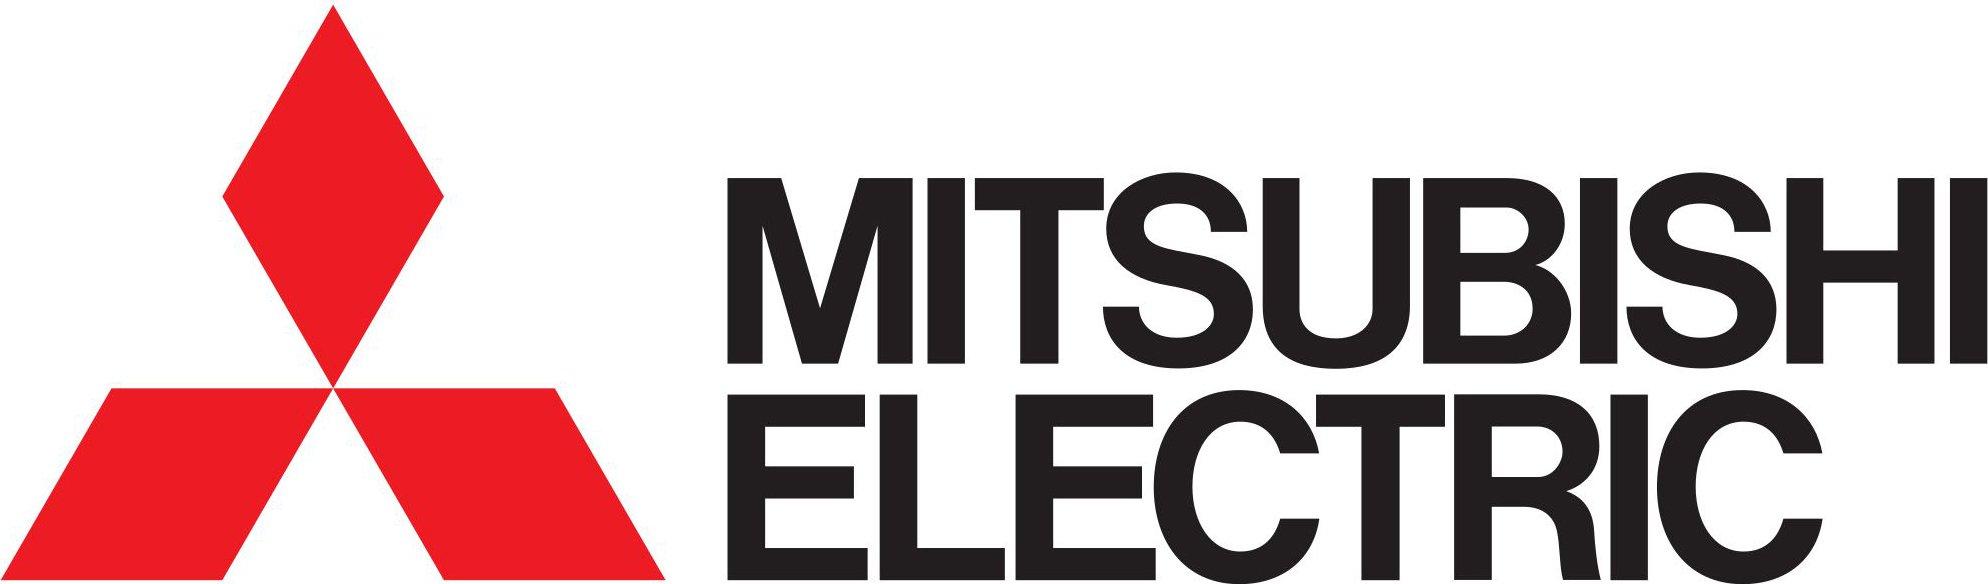 Mitsubishi_Electric_logo_result